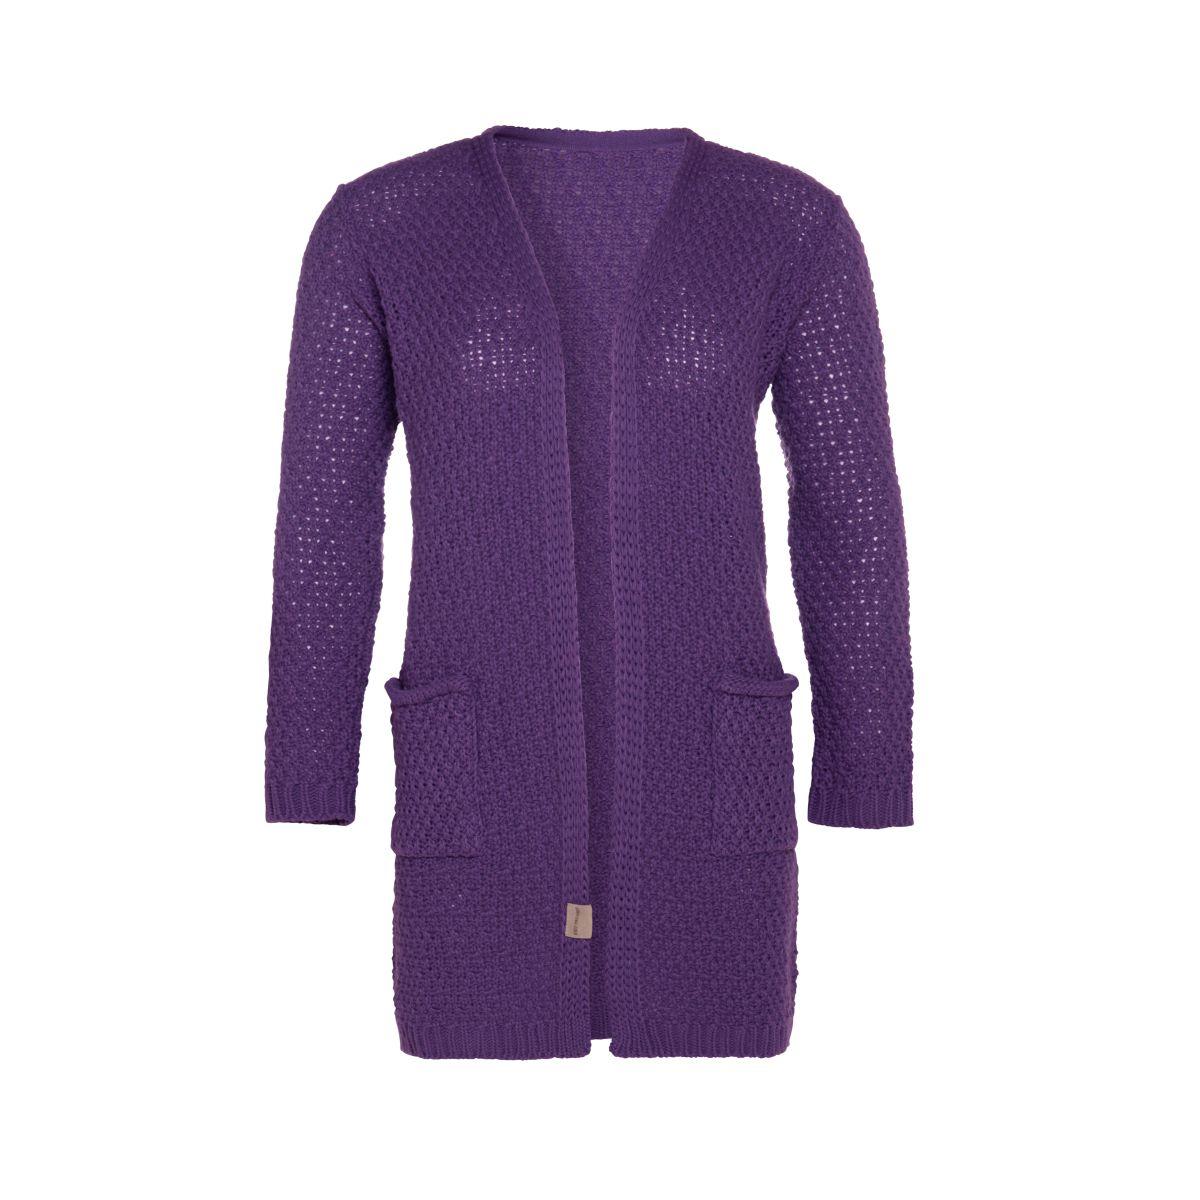 knit factory kf13308112349 luna vest purple 3638 1